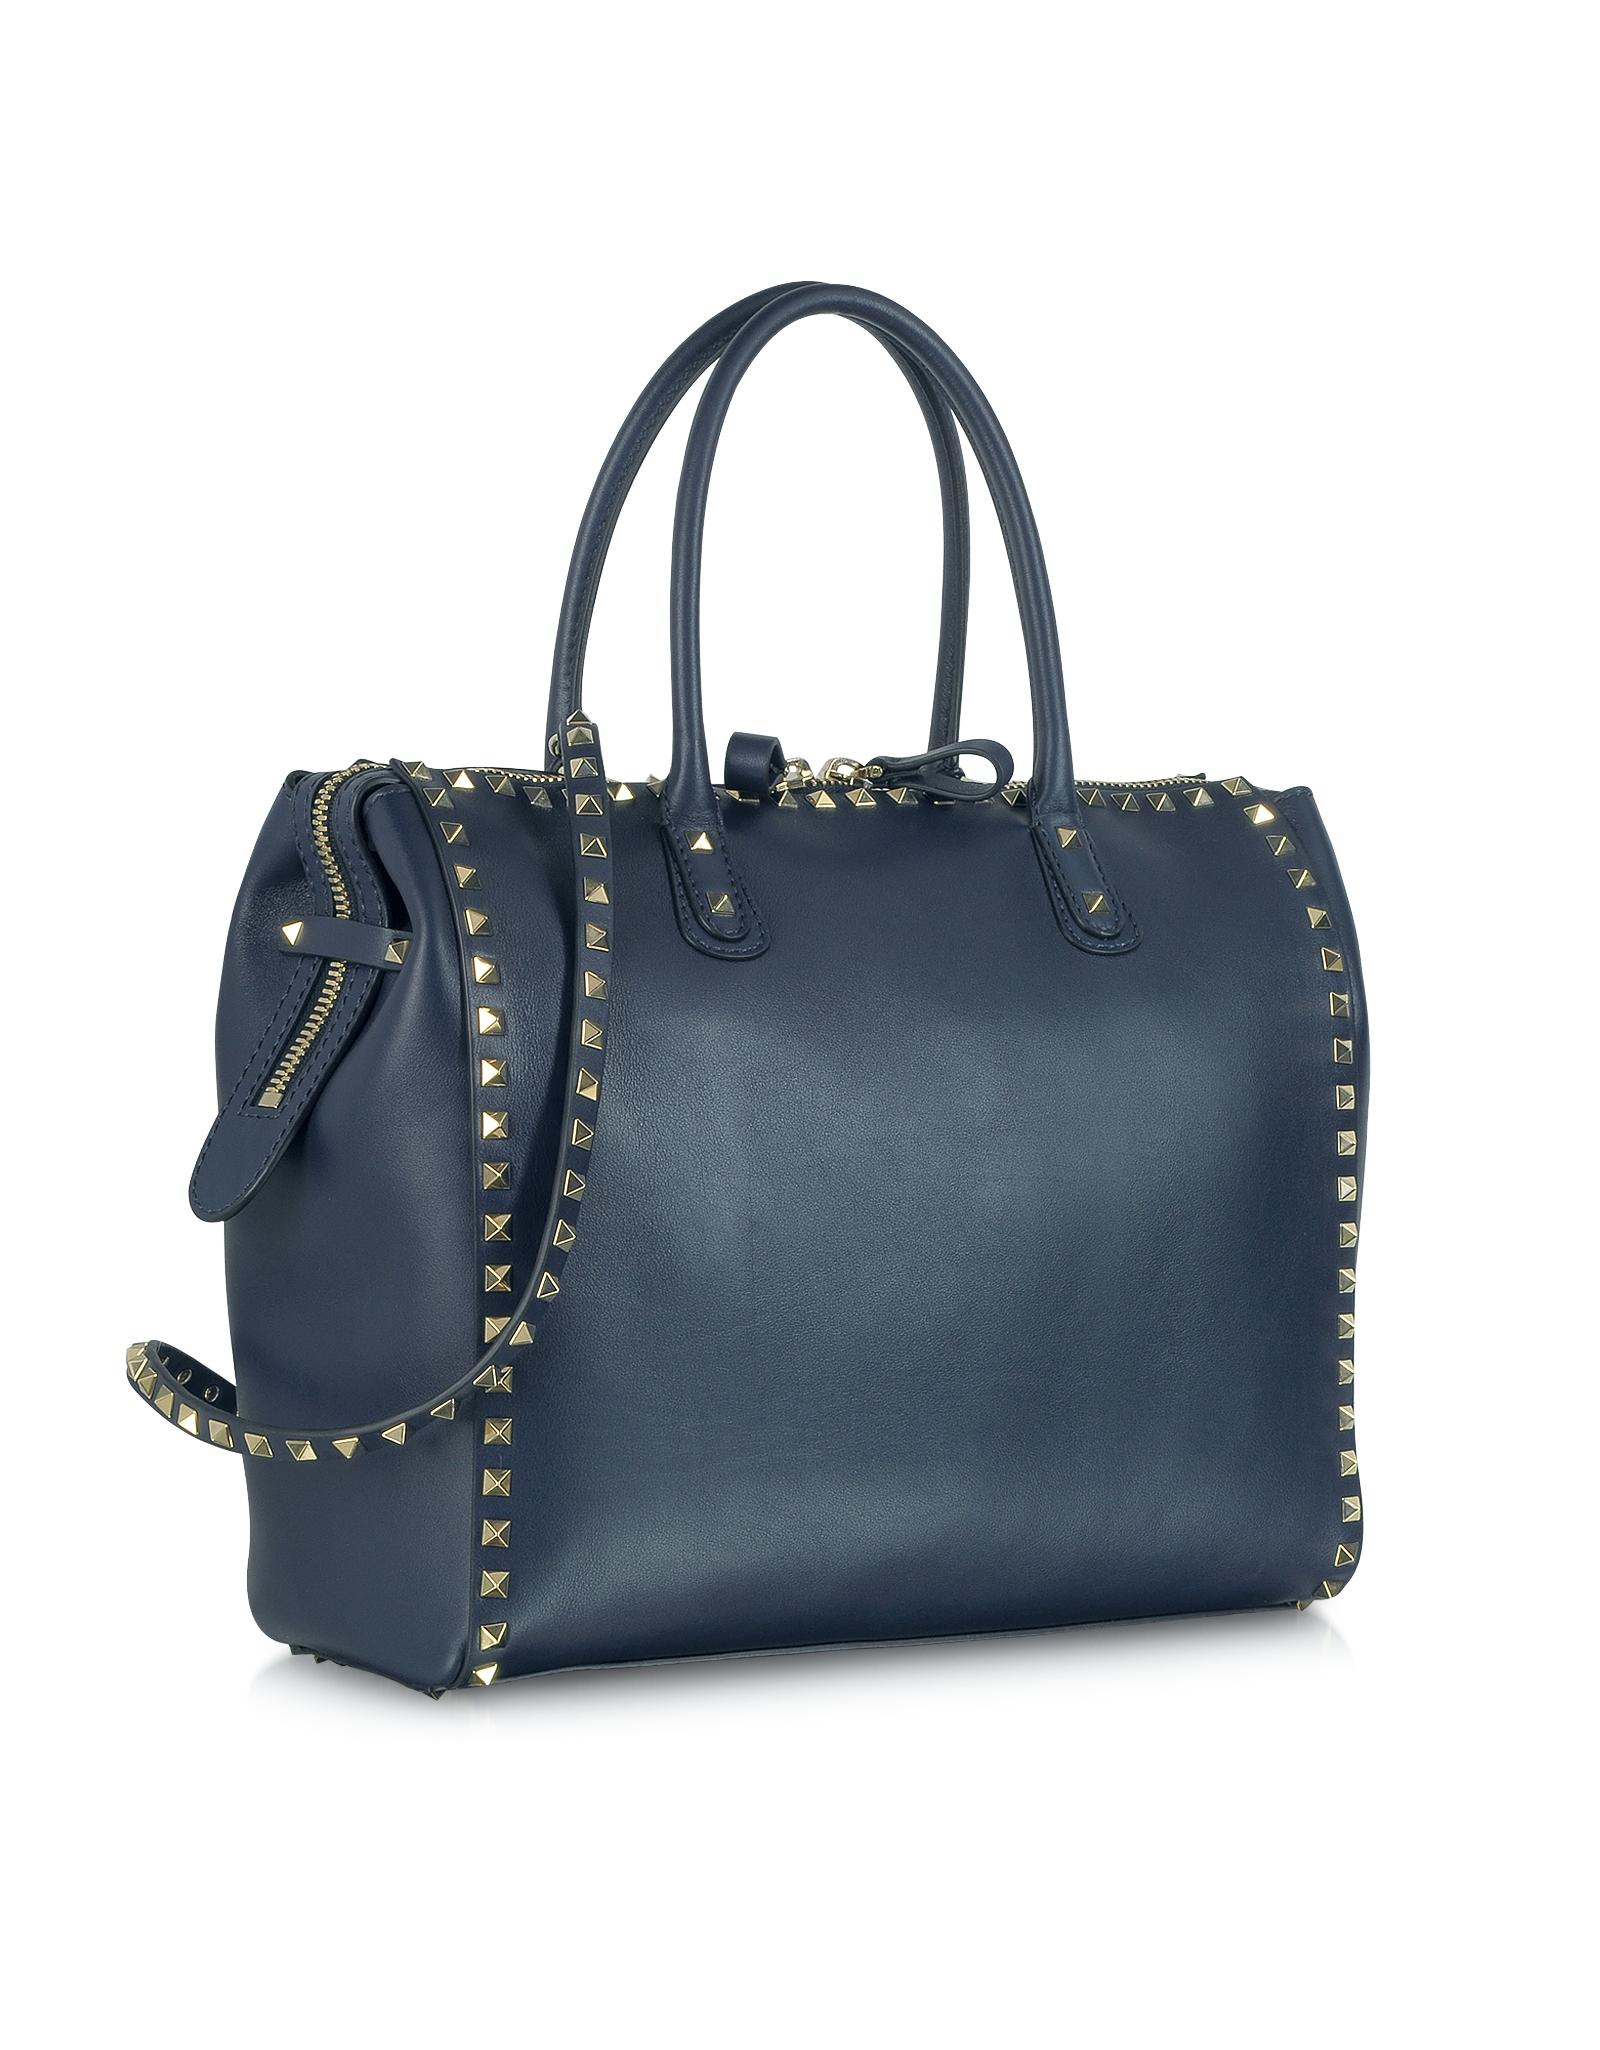 Valentino Rockstud Large Navy Blue Leather Satchel Bag in ...